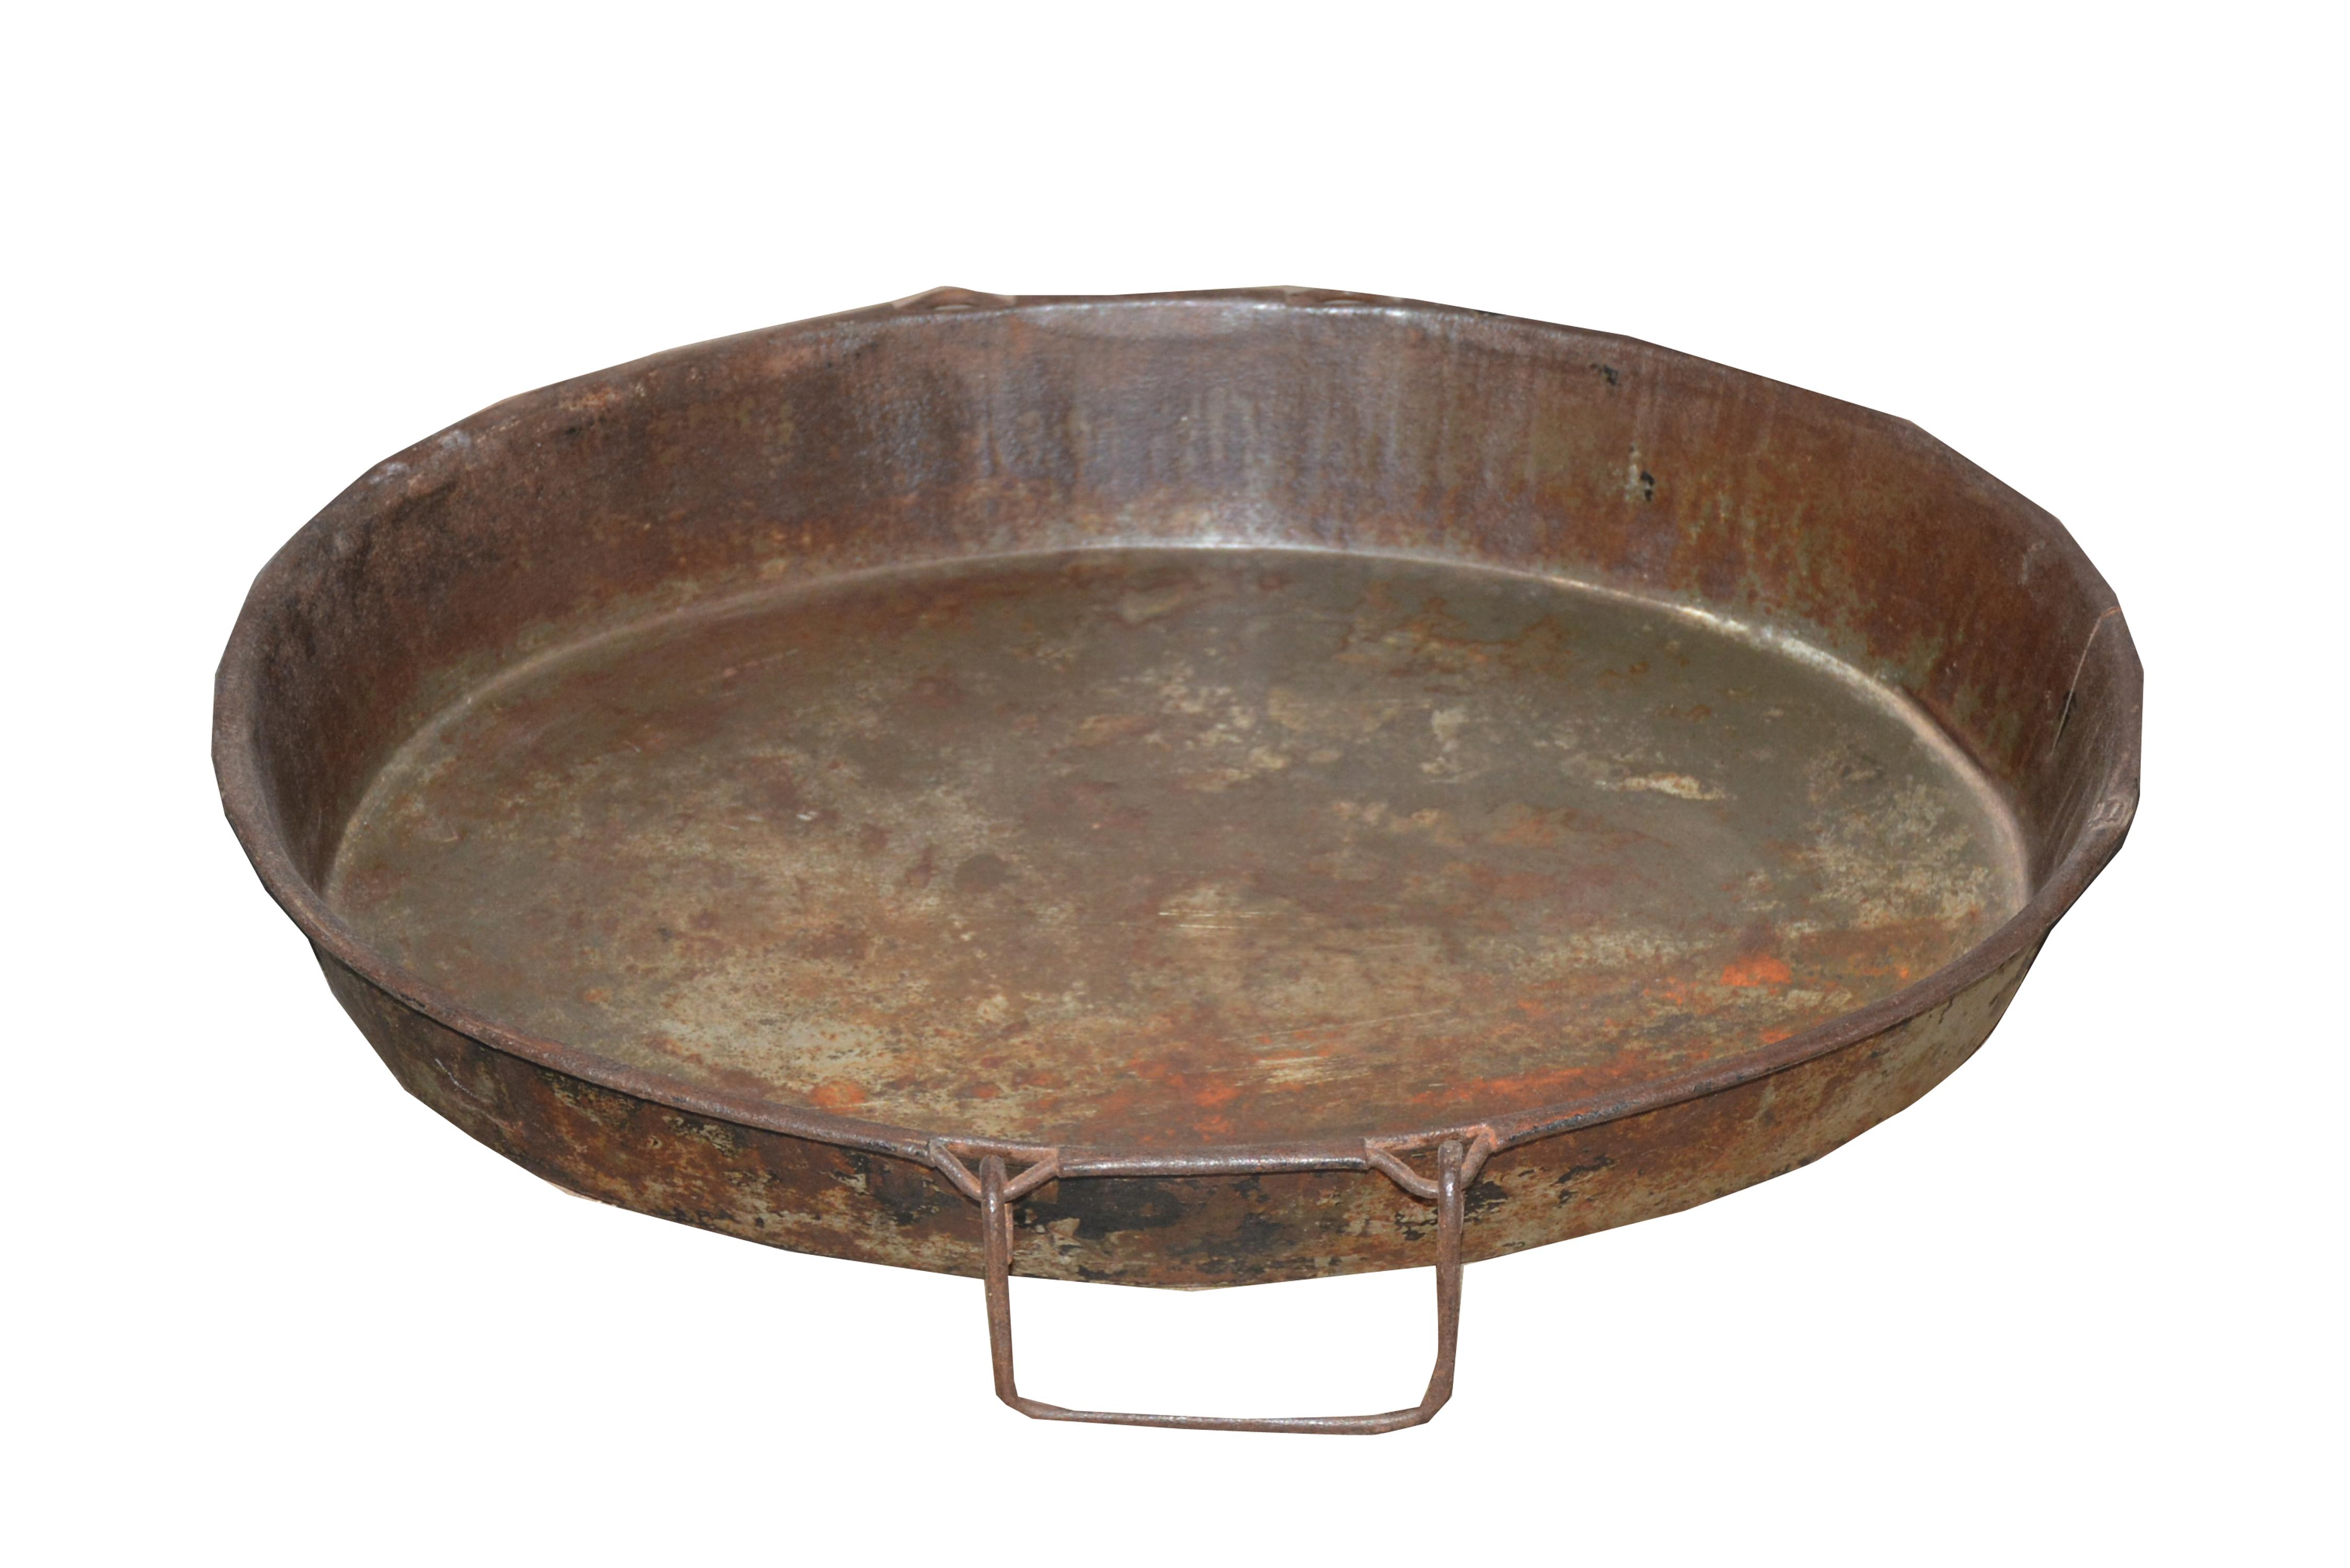 ANRA1667 - 36 x 28 x 6cm